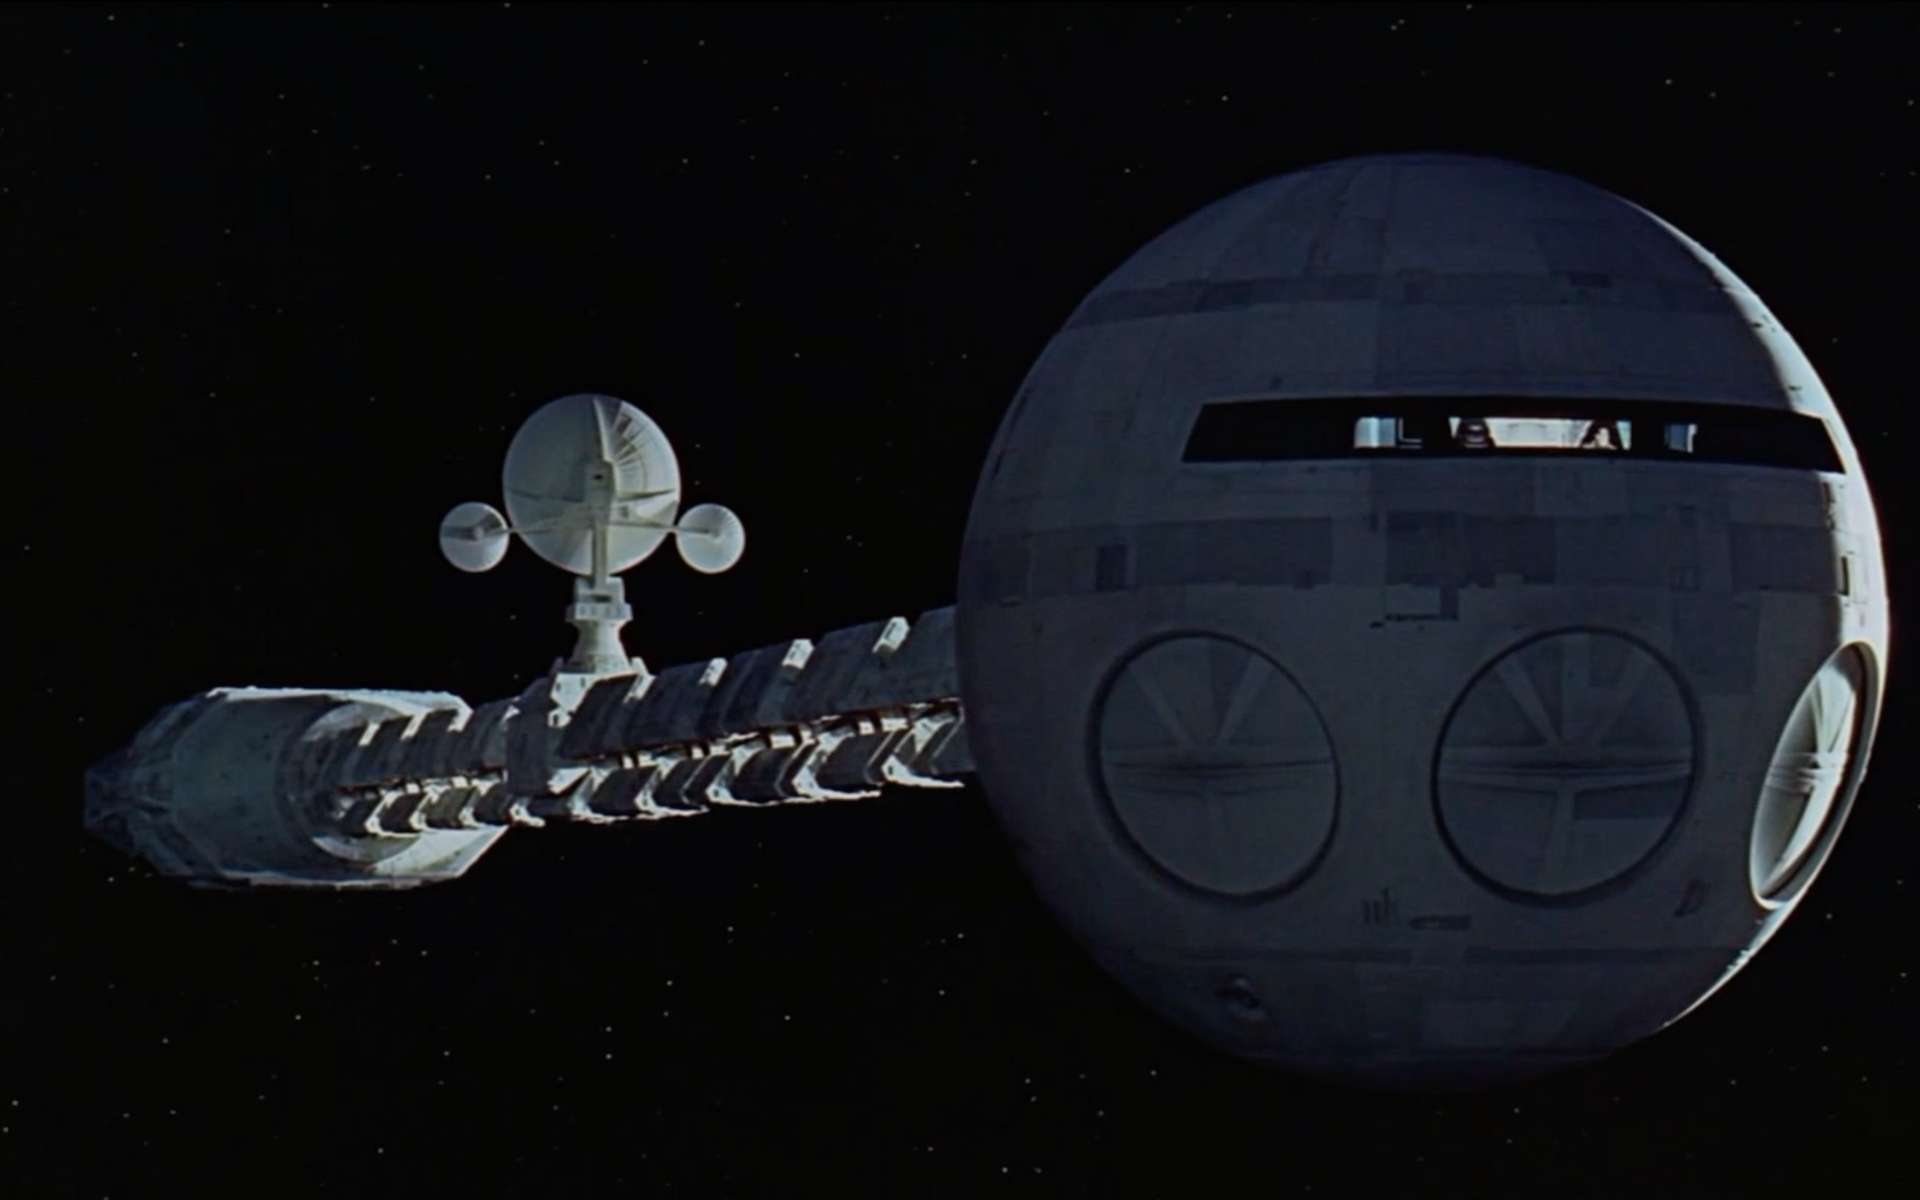 Extrait de « 2001, l'odyssée de l'espace », sorti en salles il y a 51 ans. © Warner Bros